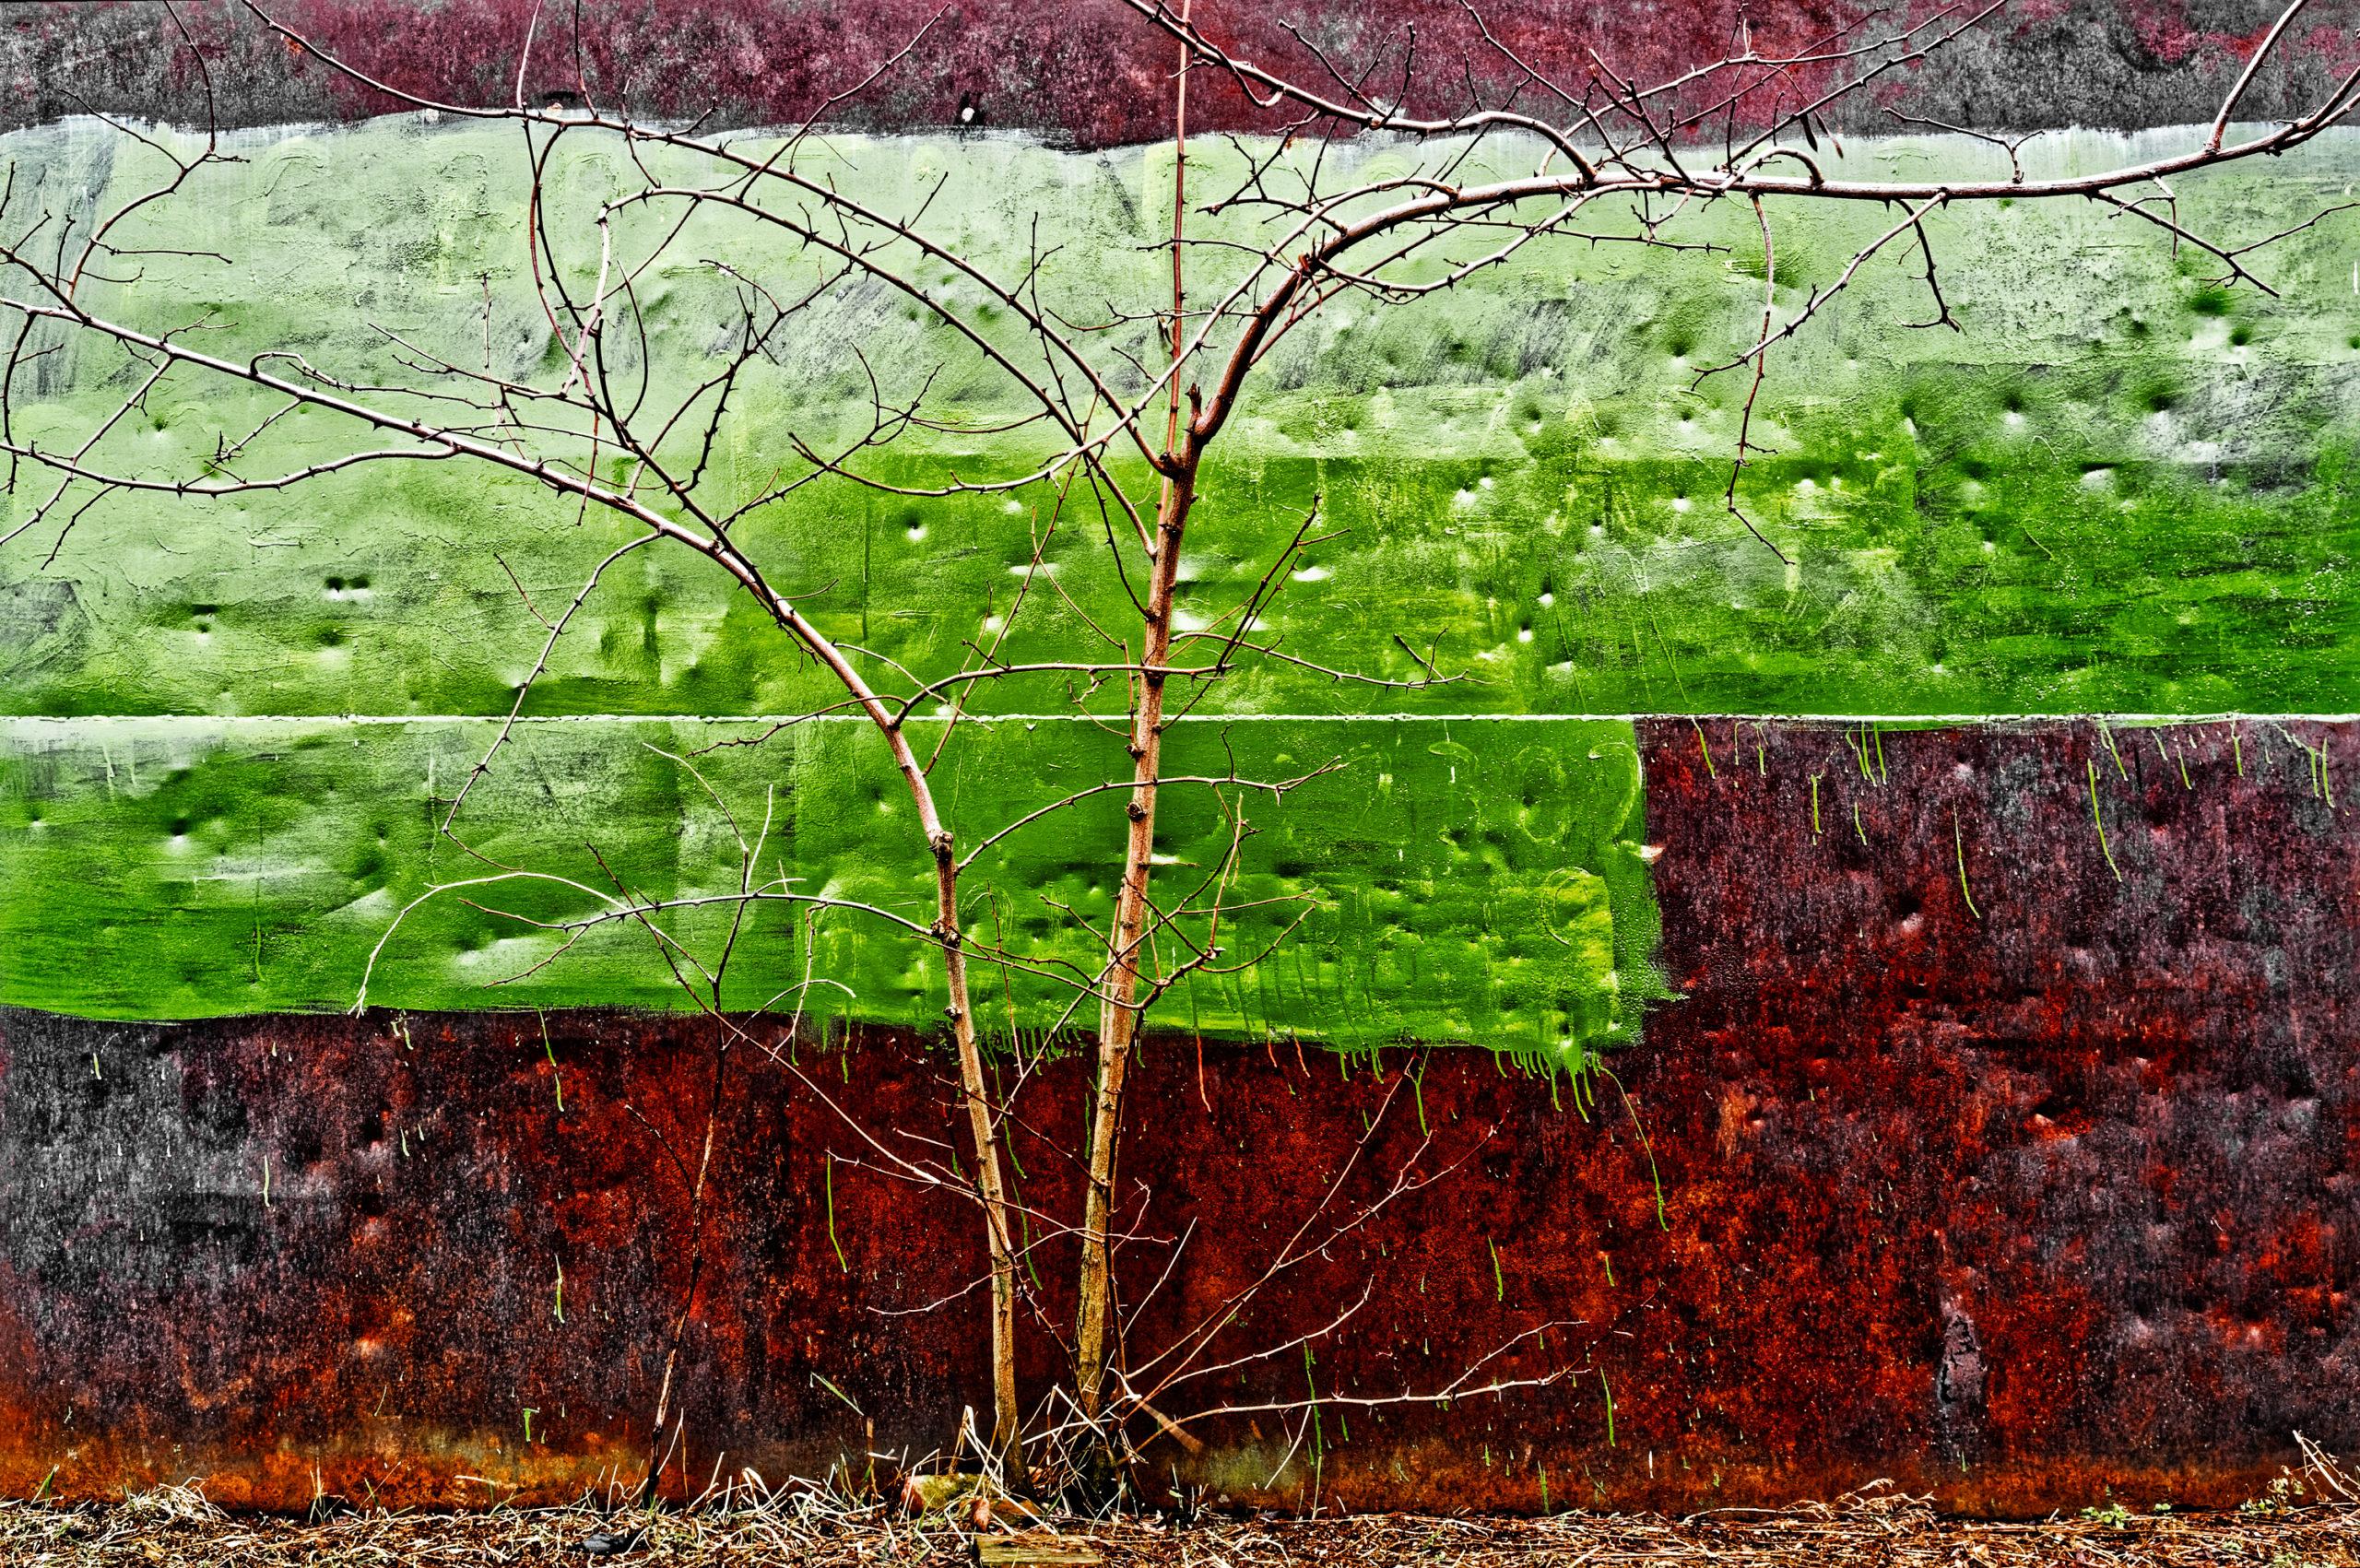 Viața merge mai departe - Galerie de fotografii Marcel Eremia